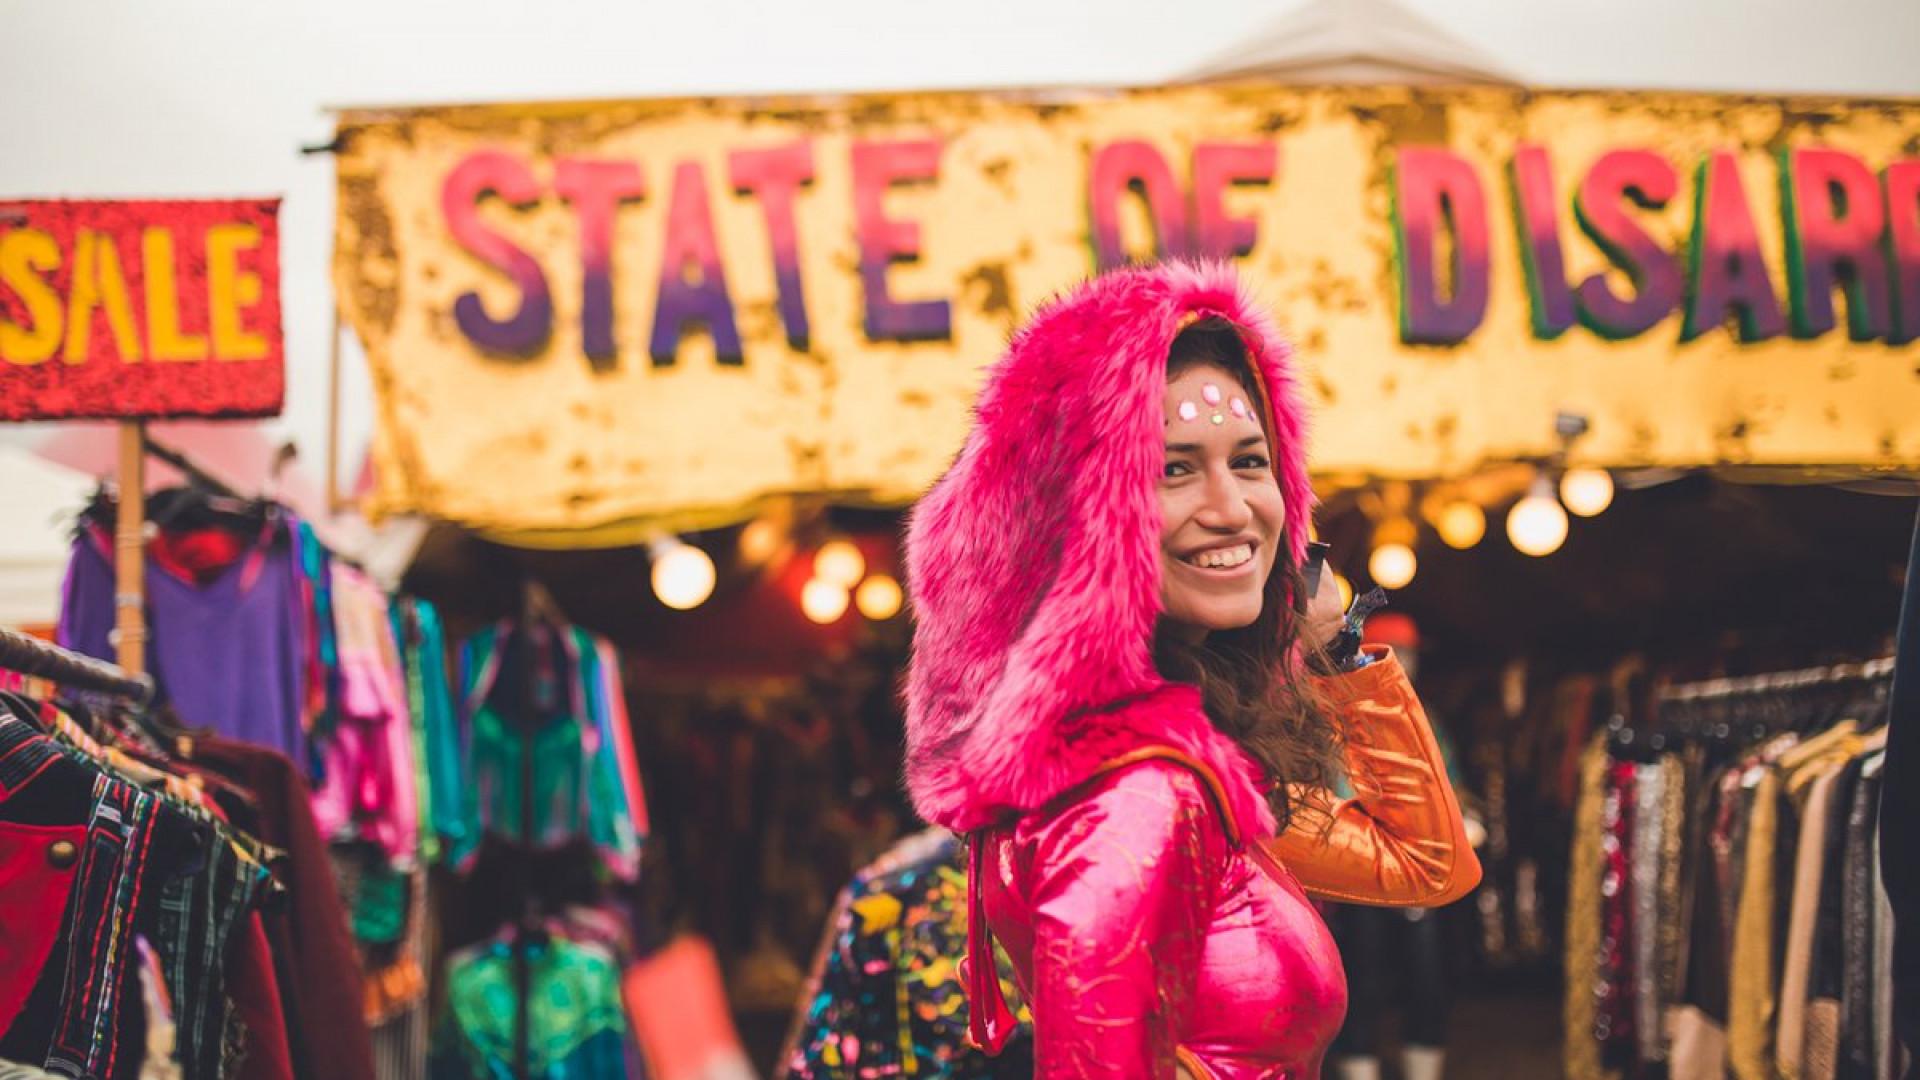 Farr Festival is full of festival outfits